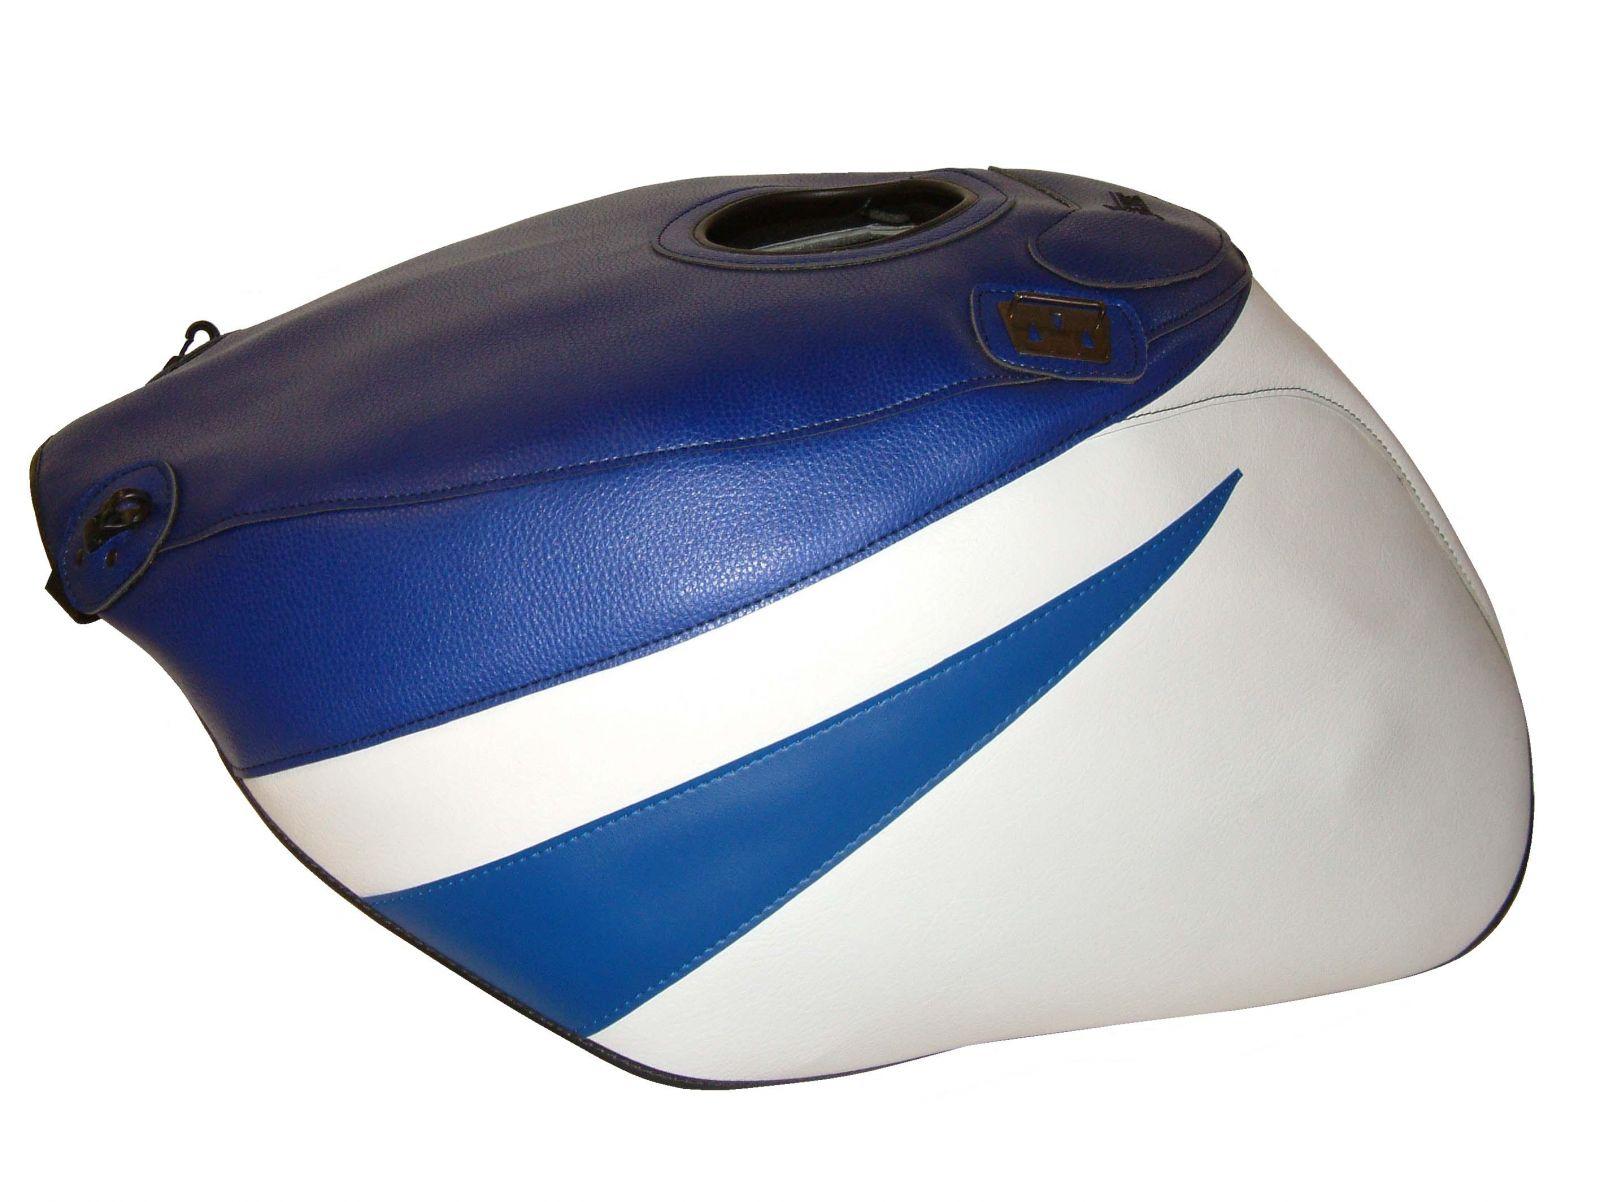 Tapis protège-réservoir TPR1951 - SUZUKI GSX-R 1000 [2001-2002]